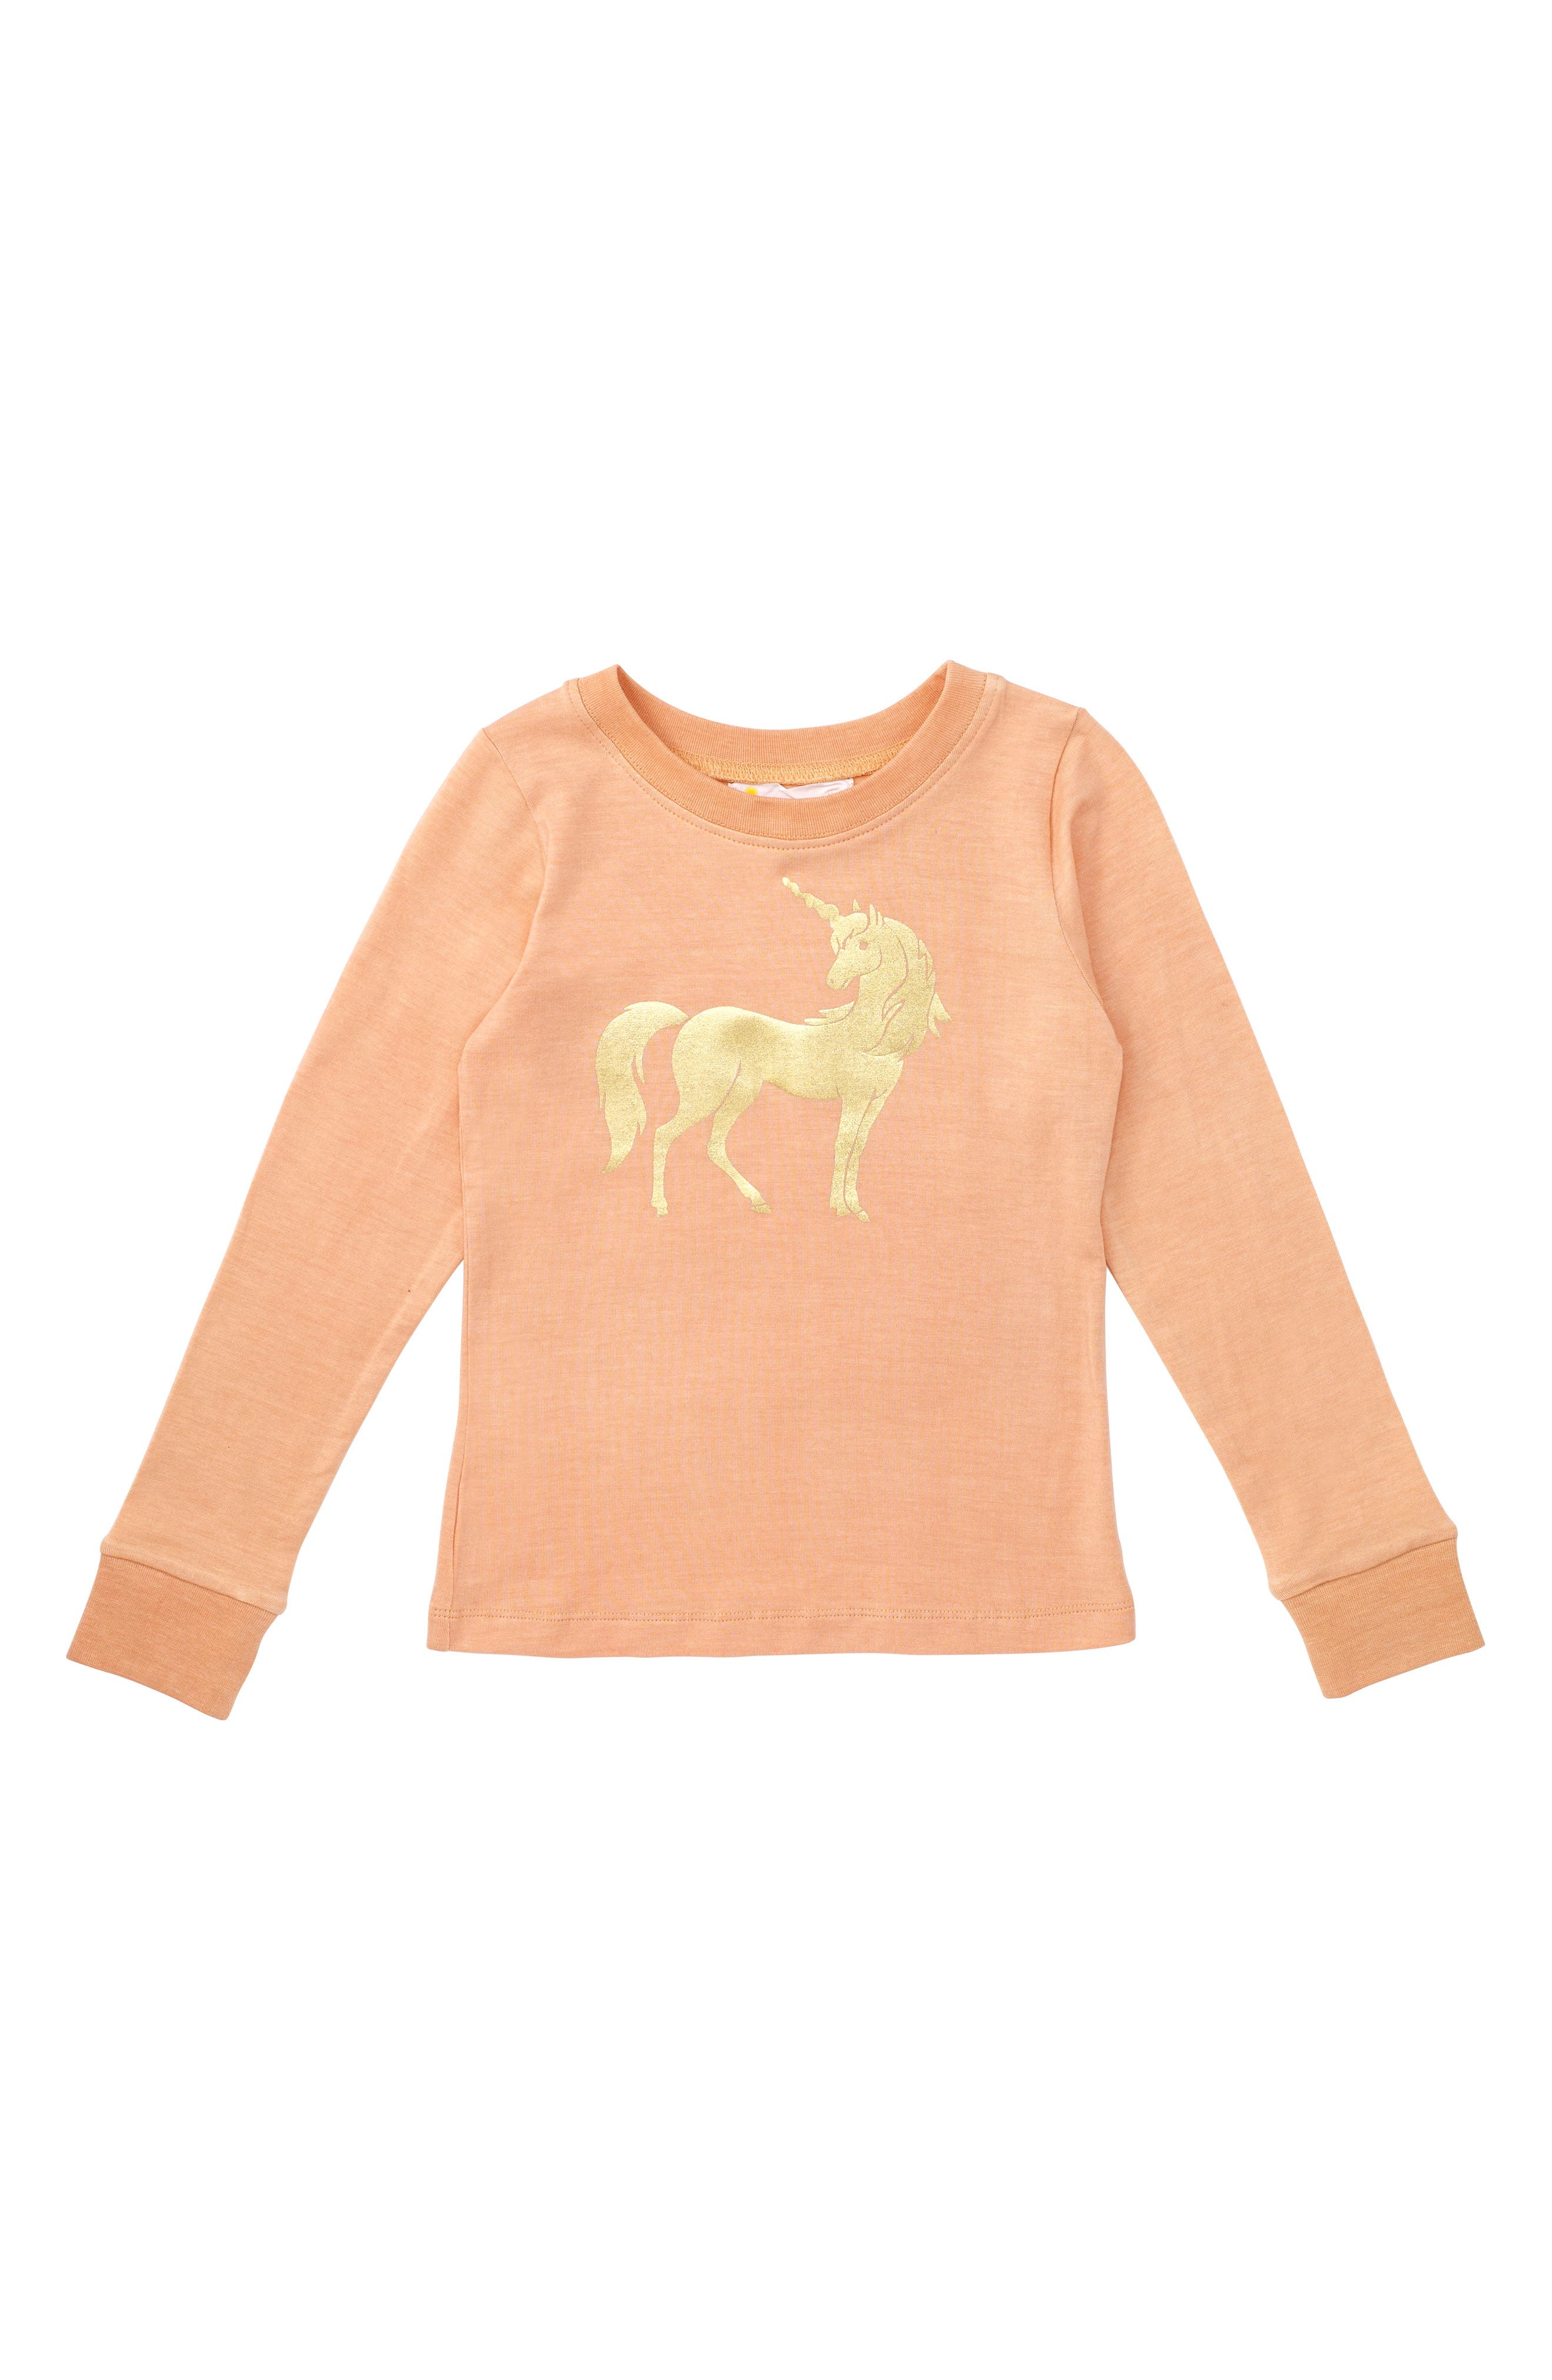 Main Image - Masalababy Unicorn Graphic Tee (Toddler Girls, Little Girls & Big Girls)